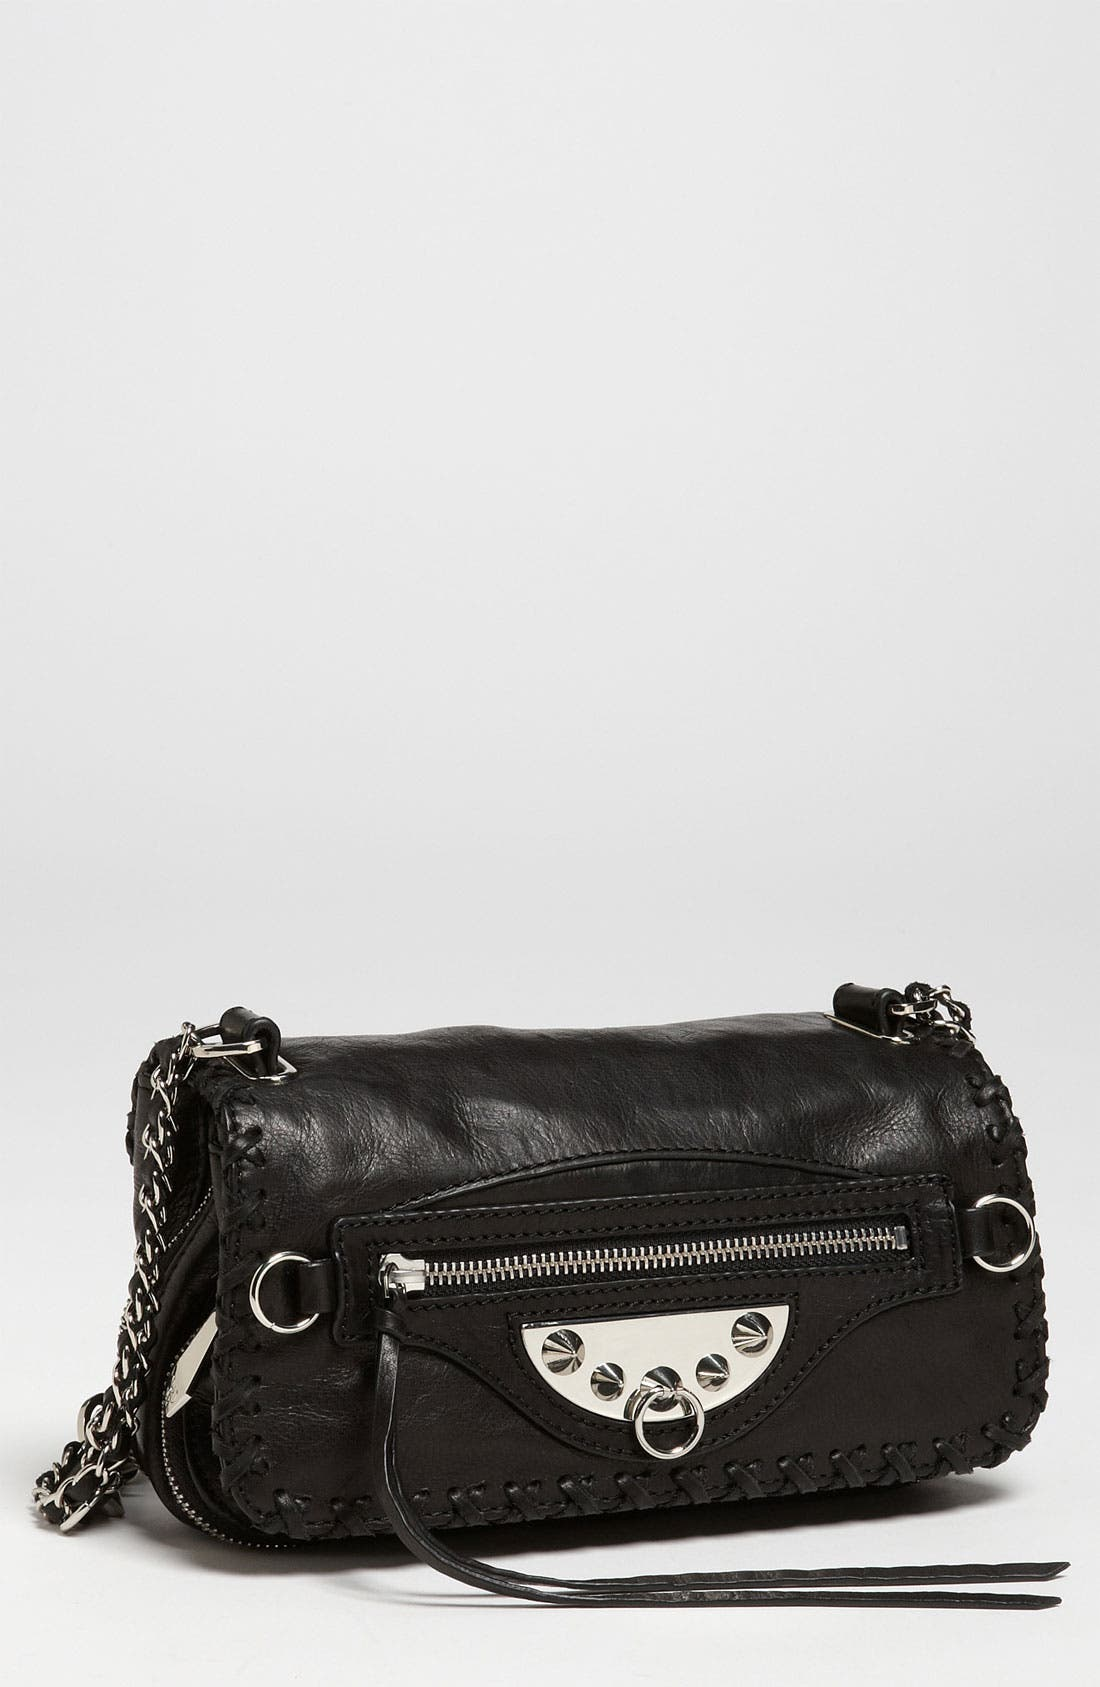 Sam Edelman Marais Chantal Shoulder Bag Nordstrom Wholer Handbags And Leather Goods Modaserverpro M4b15l2